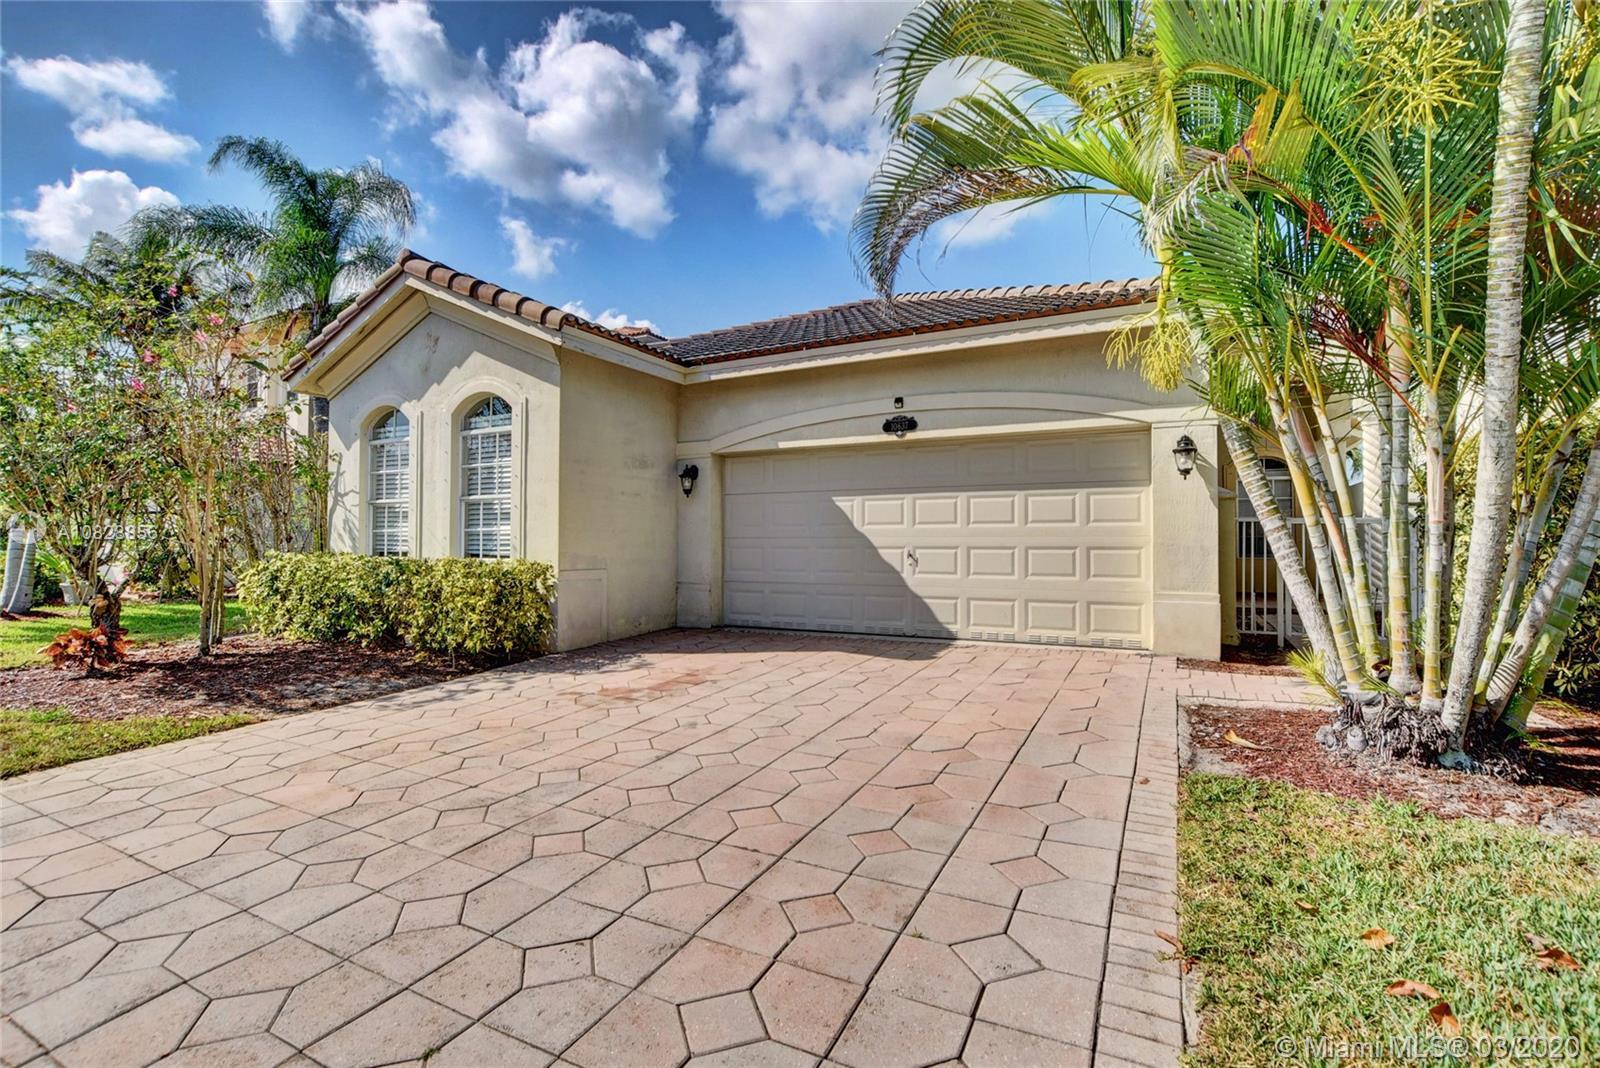 10637 Falls St, Wellington, FL 33414 - Wellington, FL real estate listing